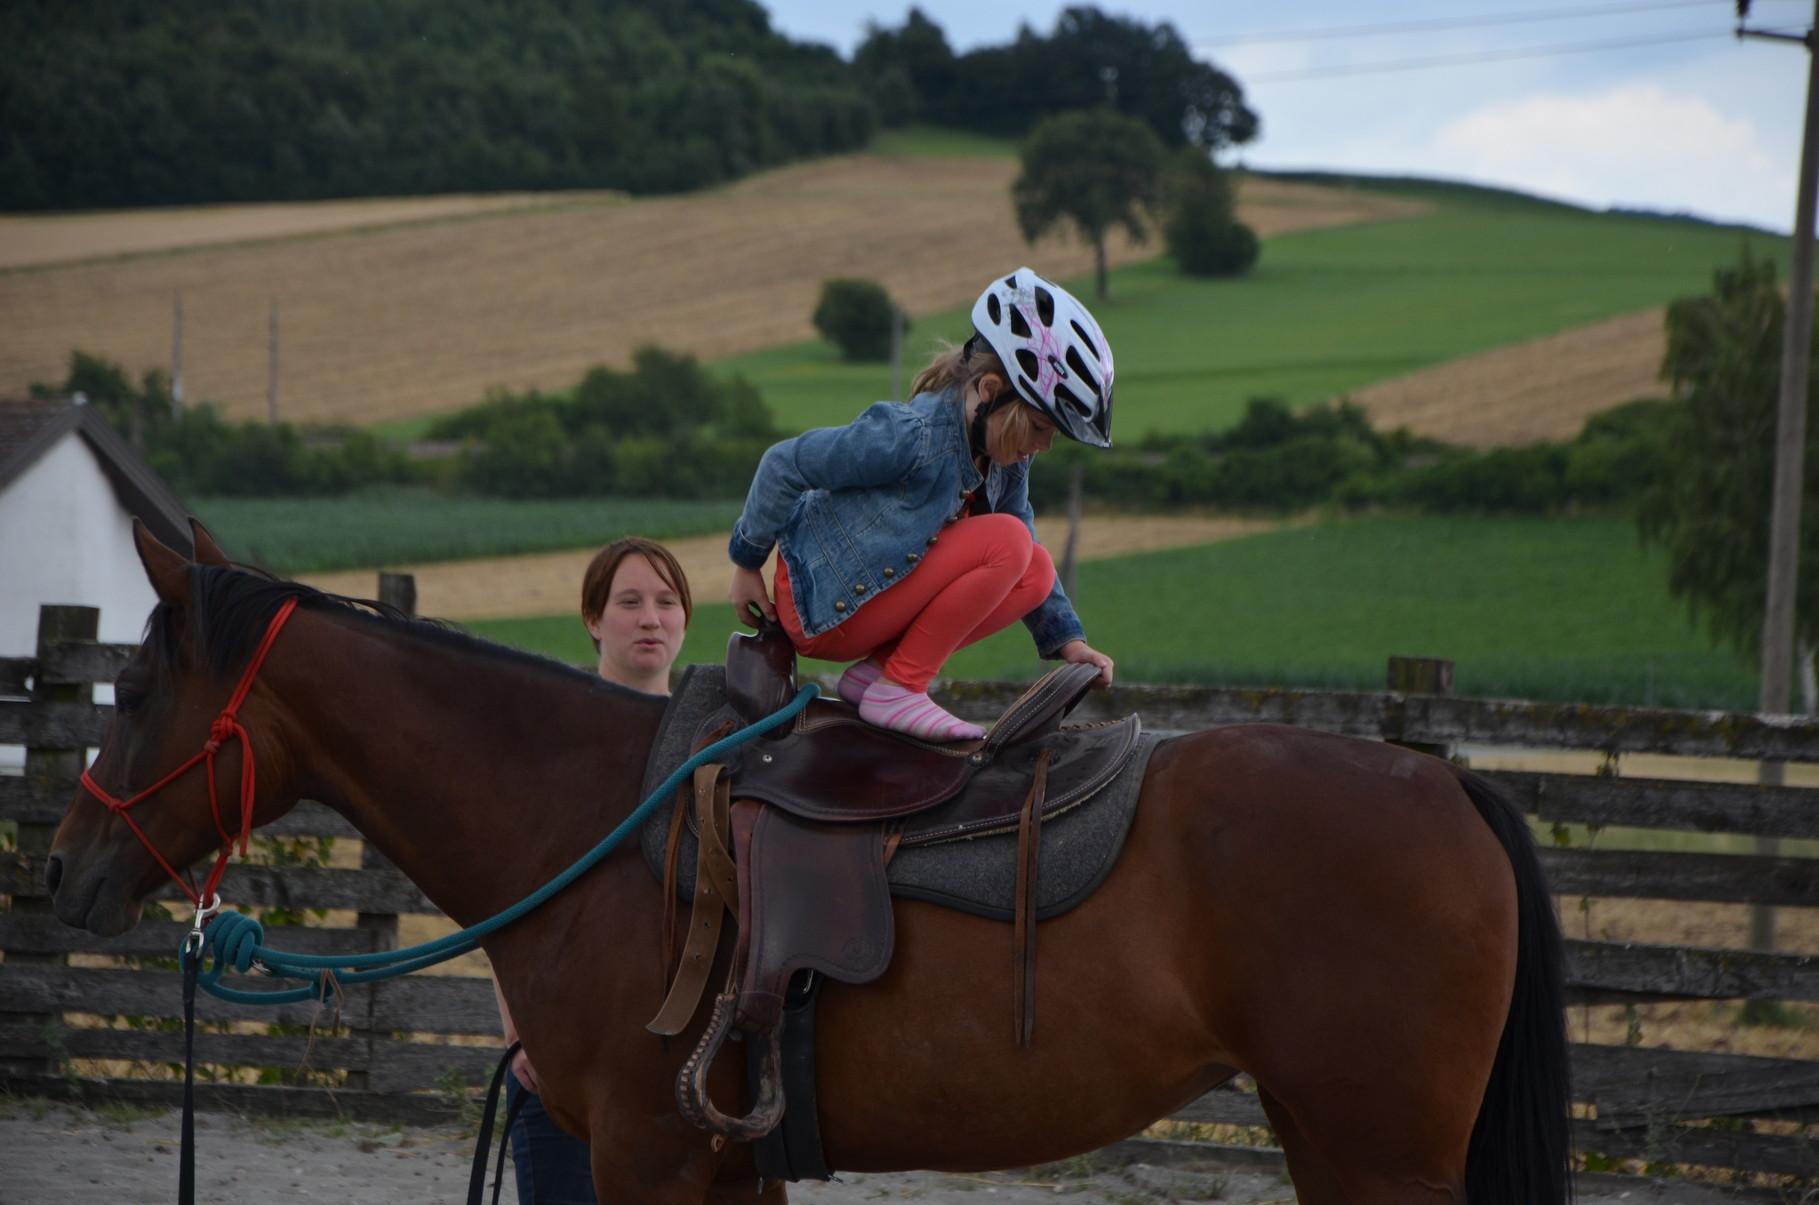 Turnen am Pferd!